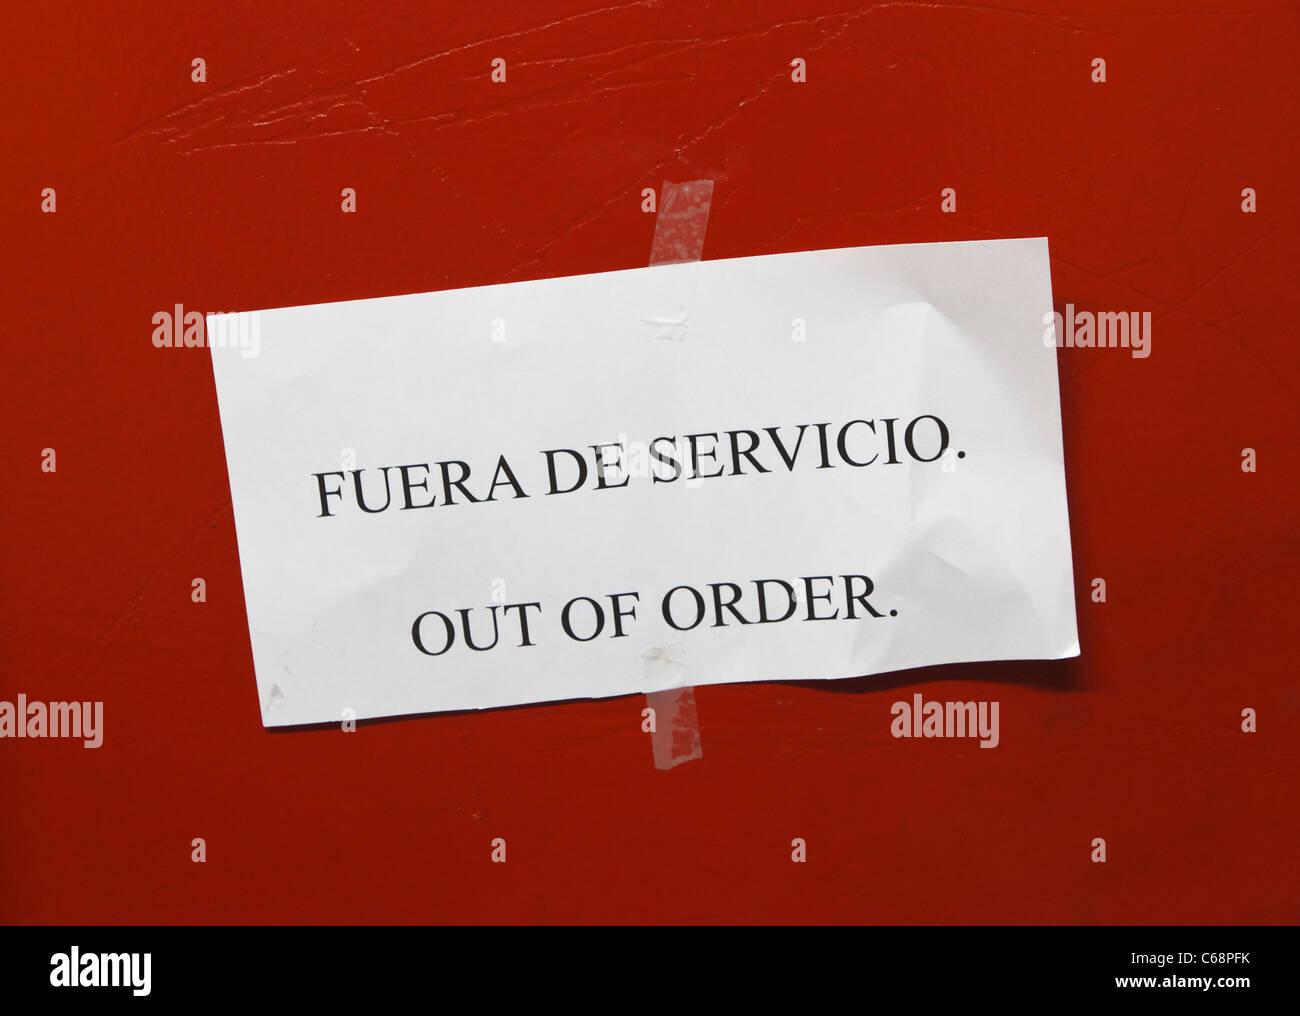 spanish and english bi lingual sign saying fuera de